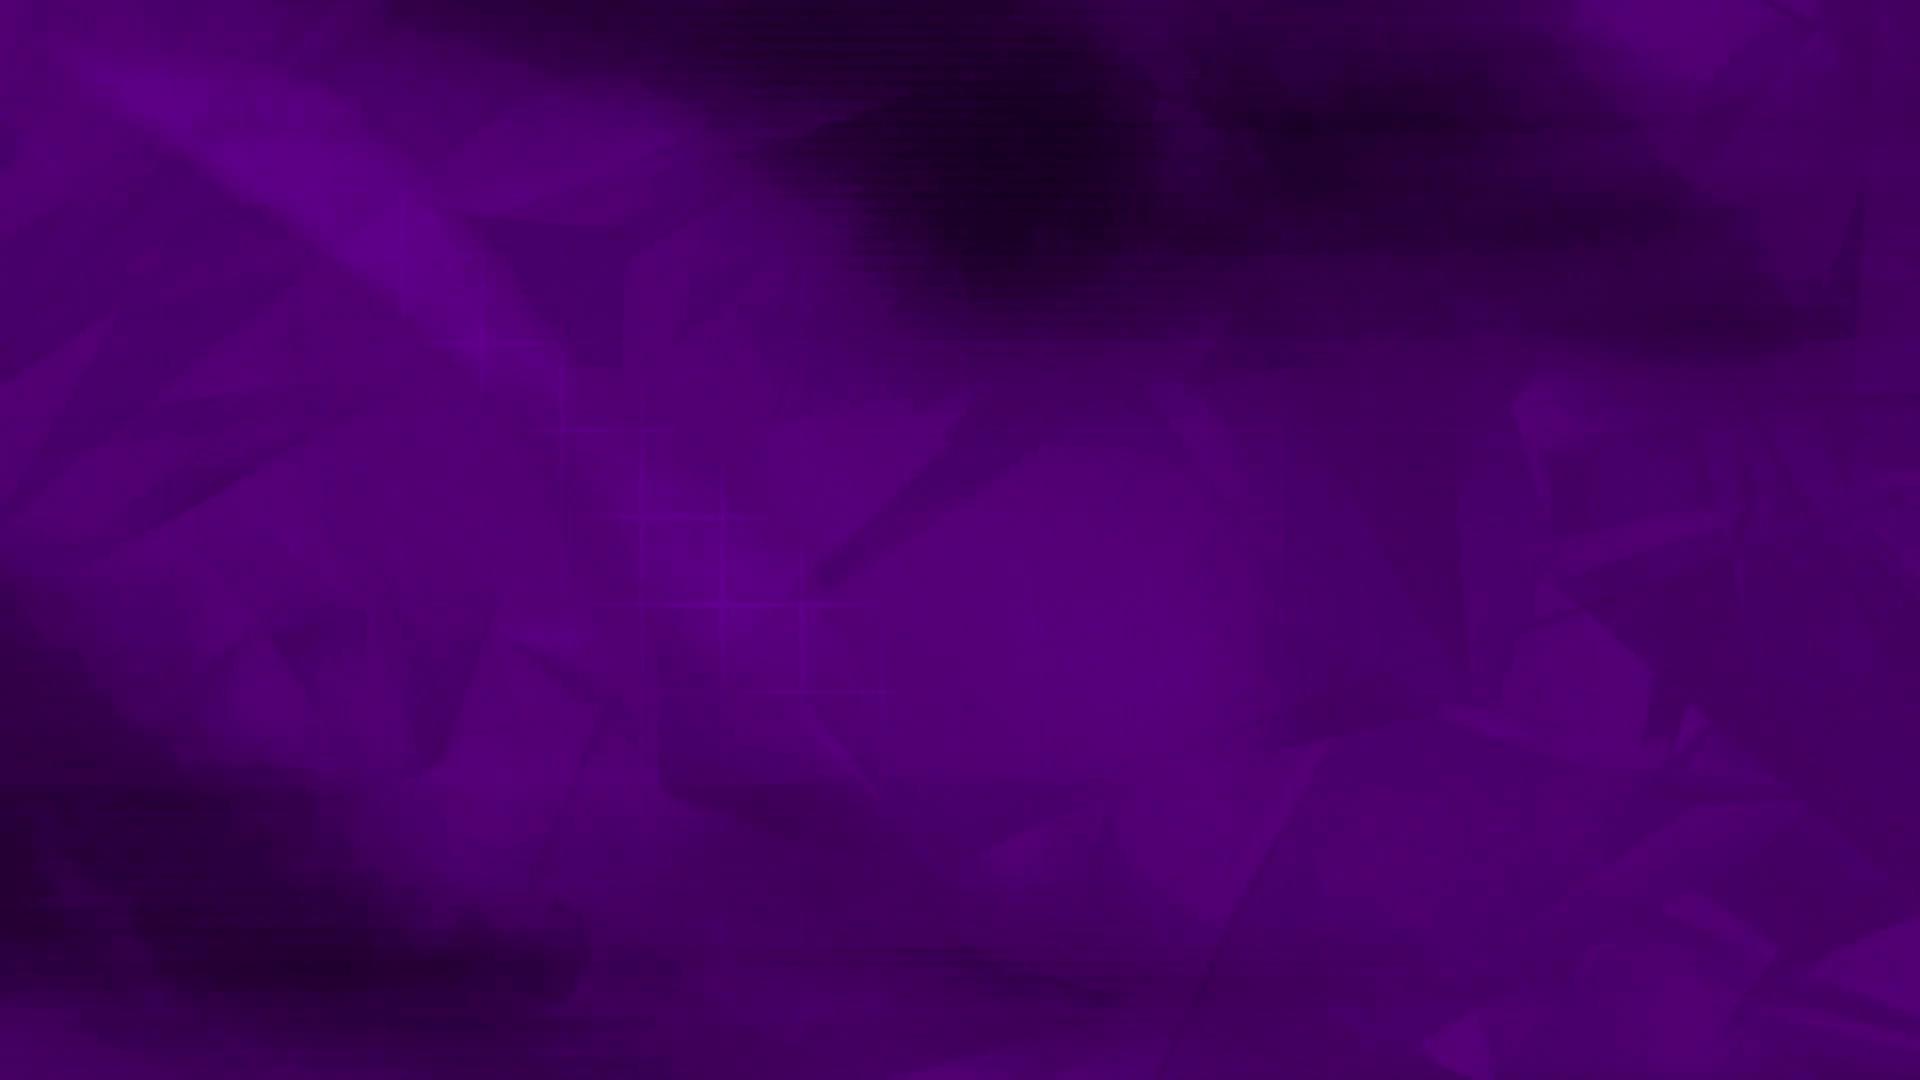 Human Fall Flat Wallpaper Free Photo Purple Abstract Background Ornament Purple